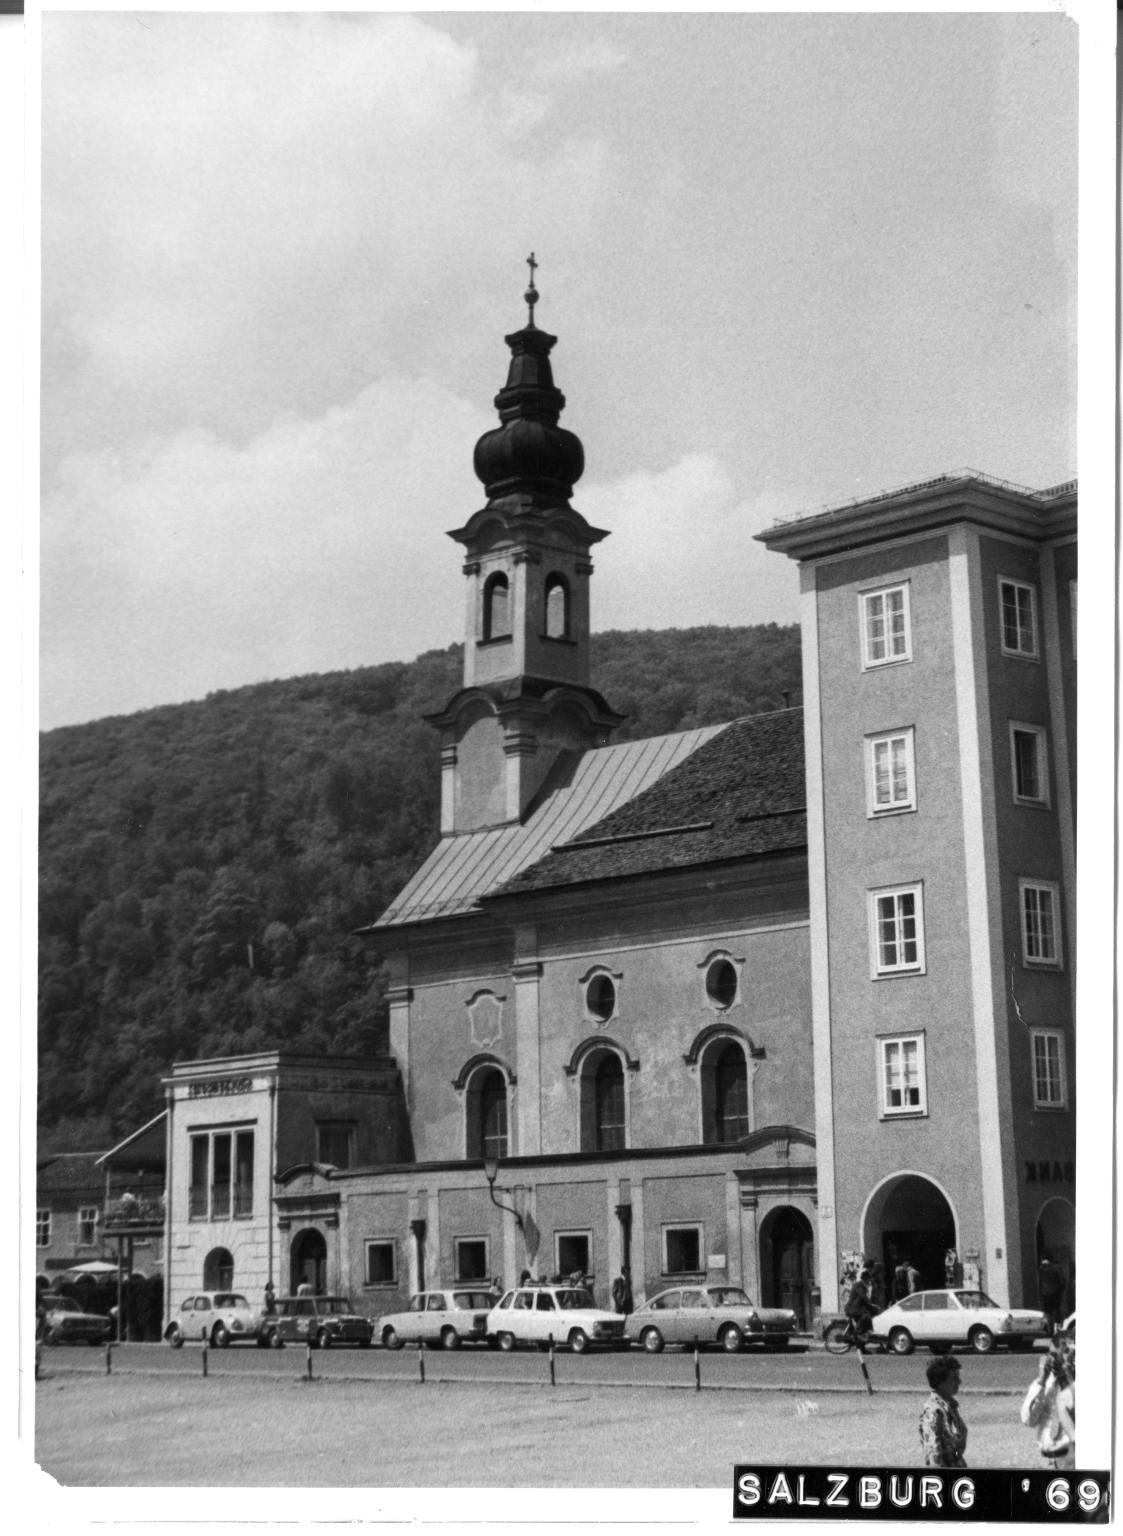 Building in Salzburg